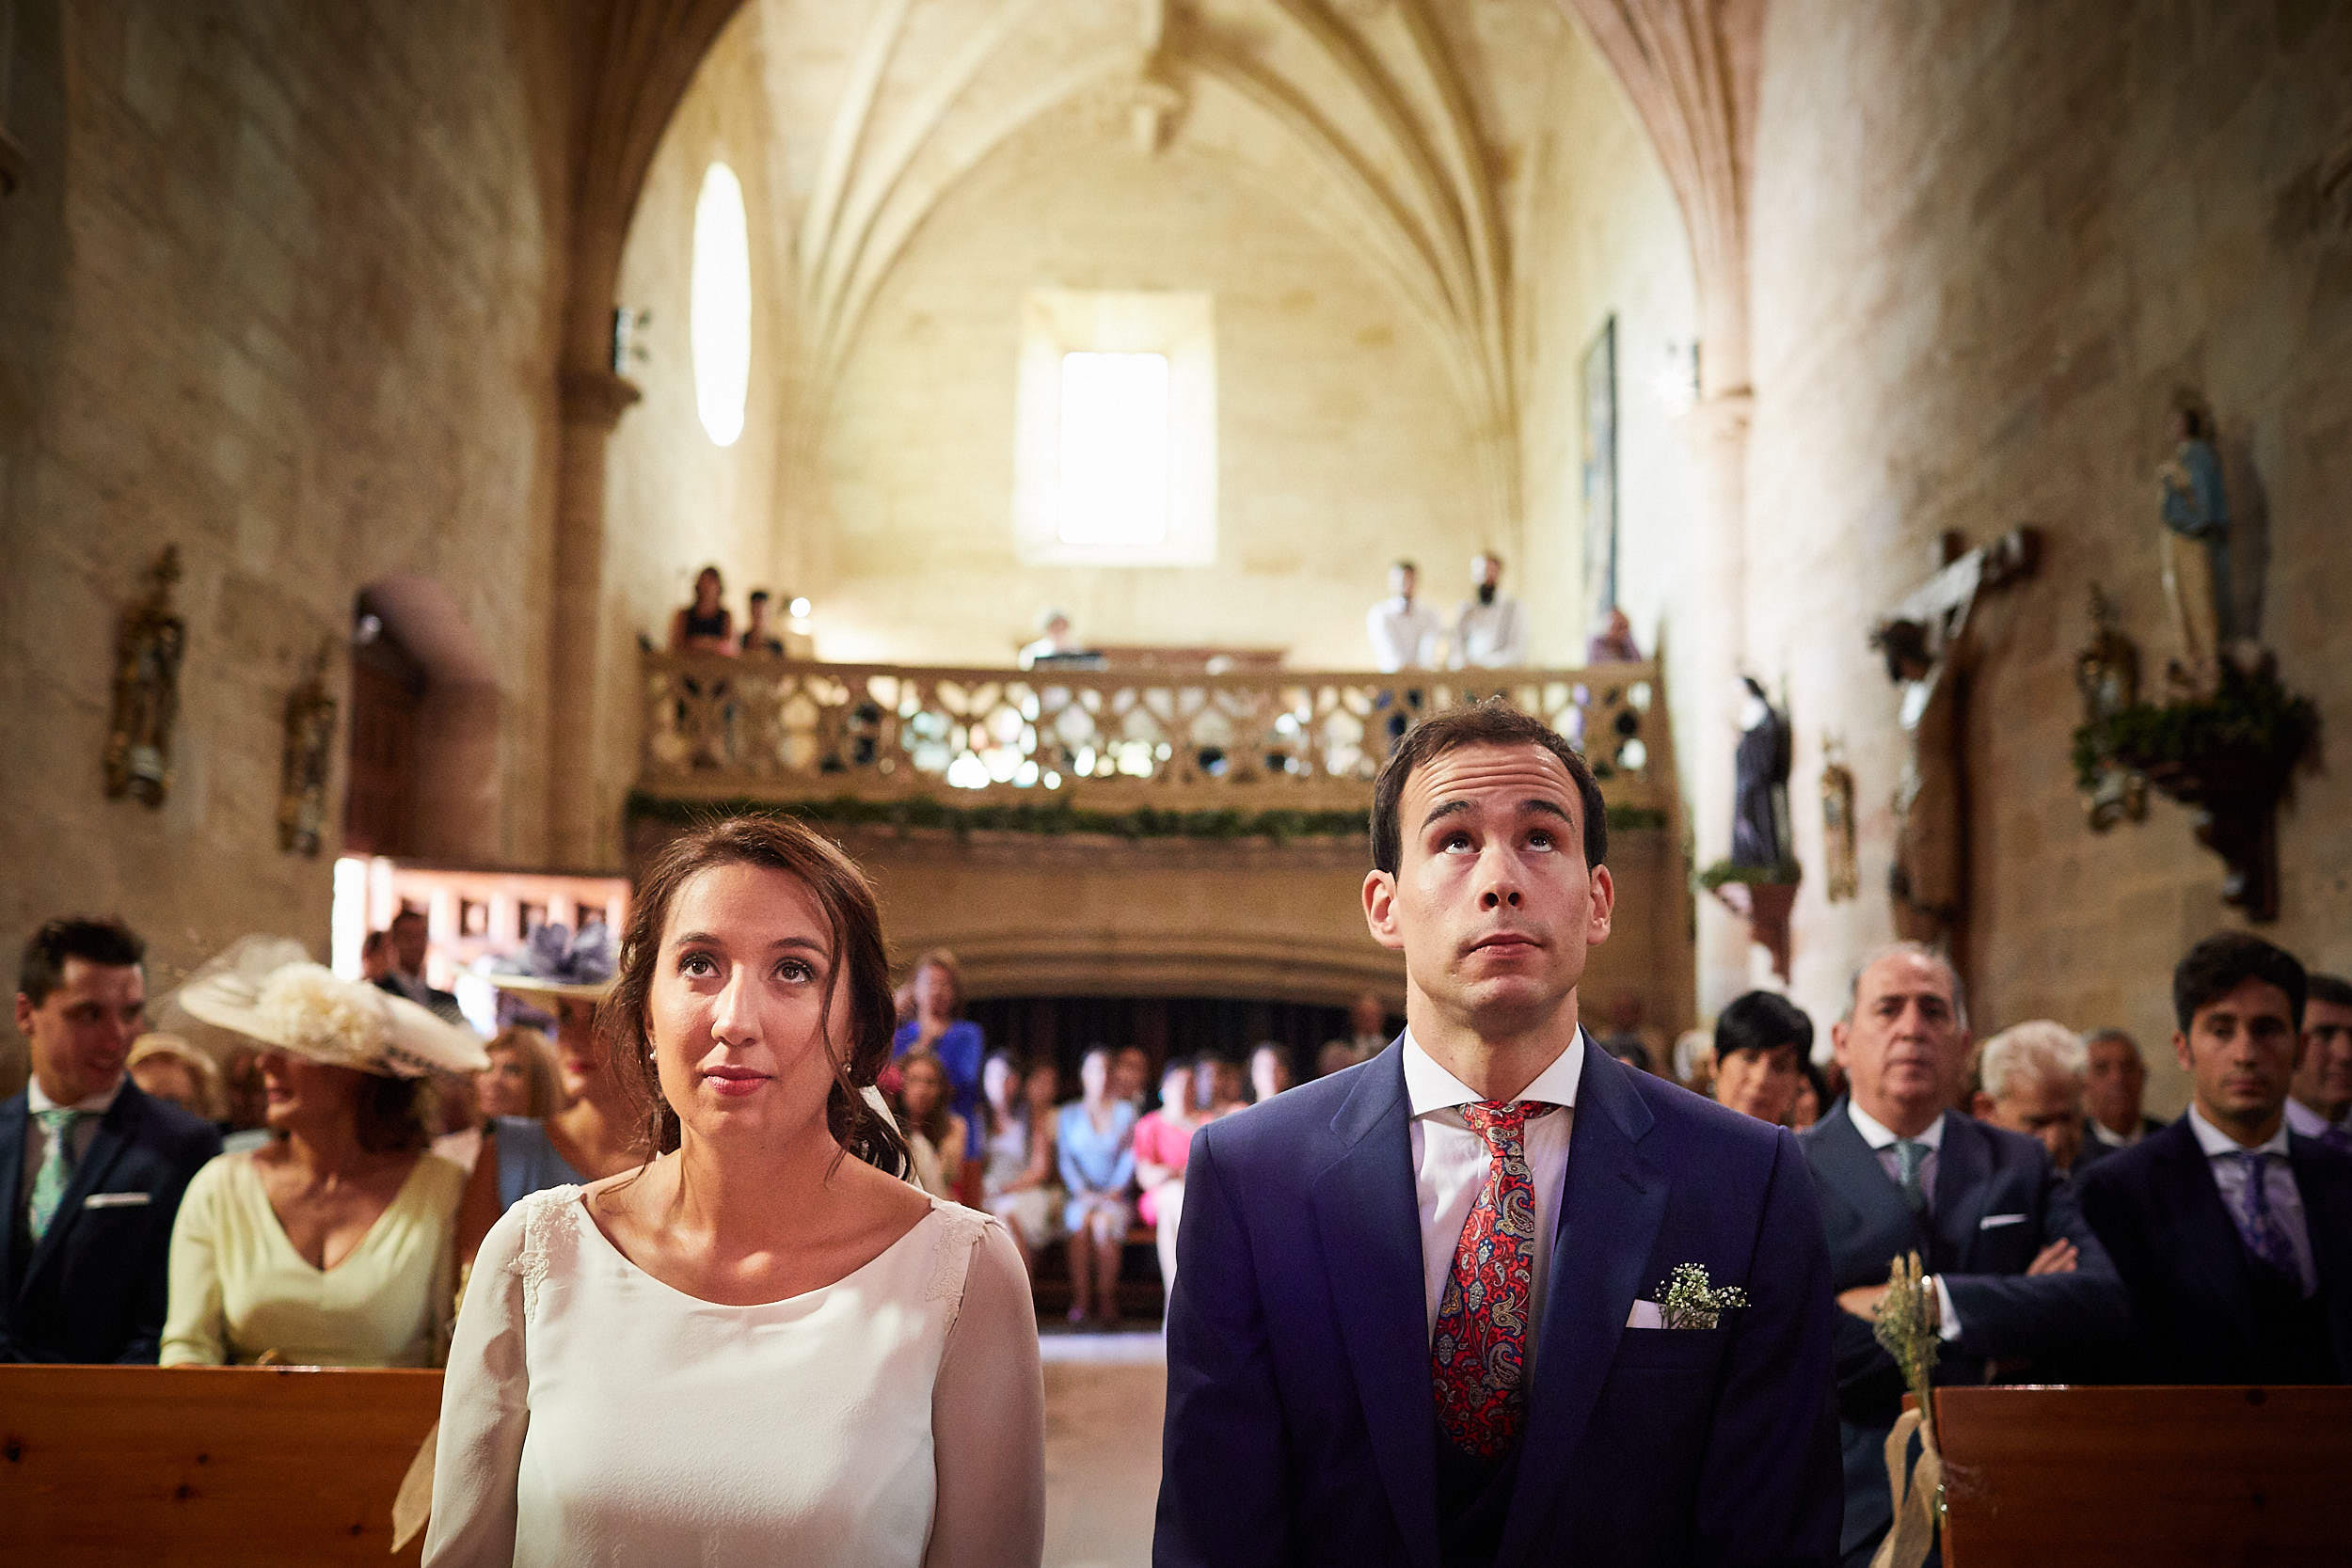 Rioja Wedding Photographer Isobel David Palacio Casafuerte Zarraton La Rioja Spain James Sturcke Photographer sturcke.org_00013.jpg